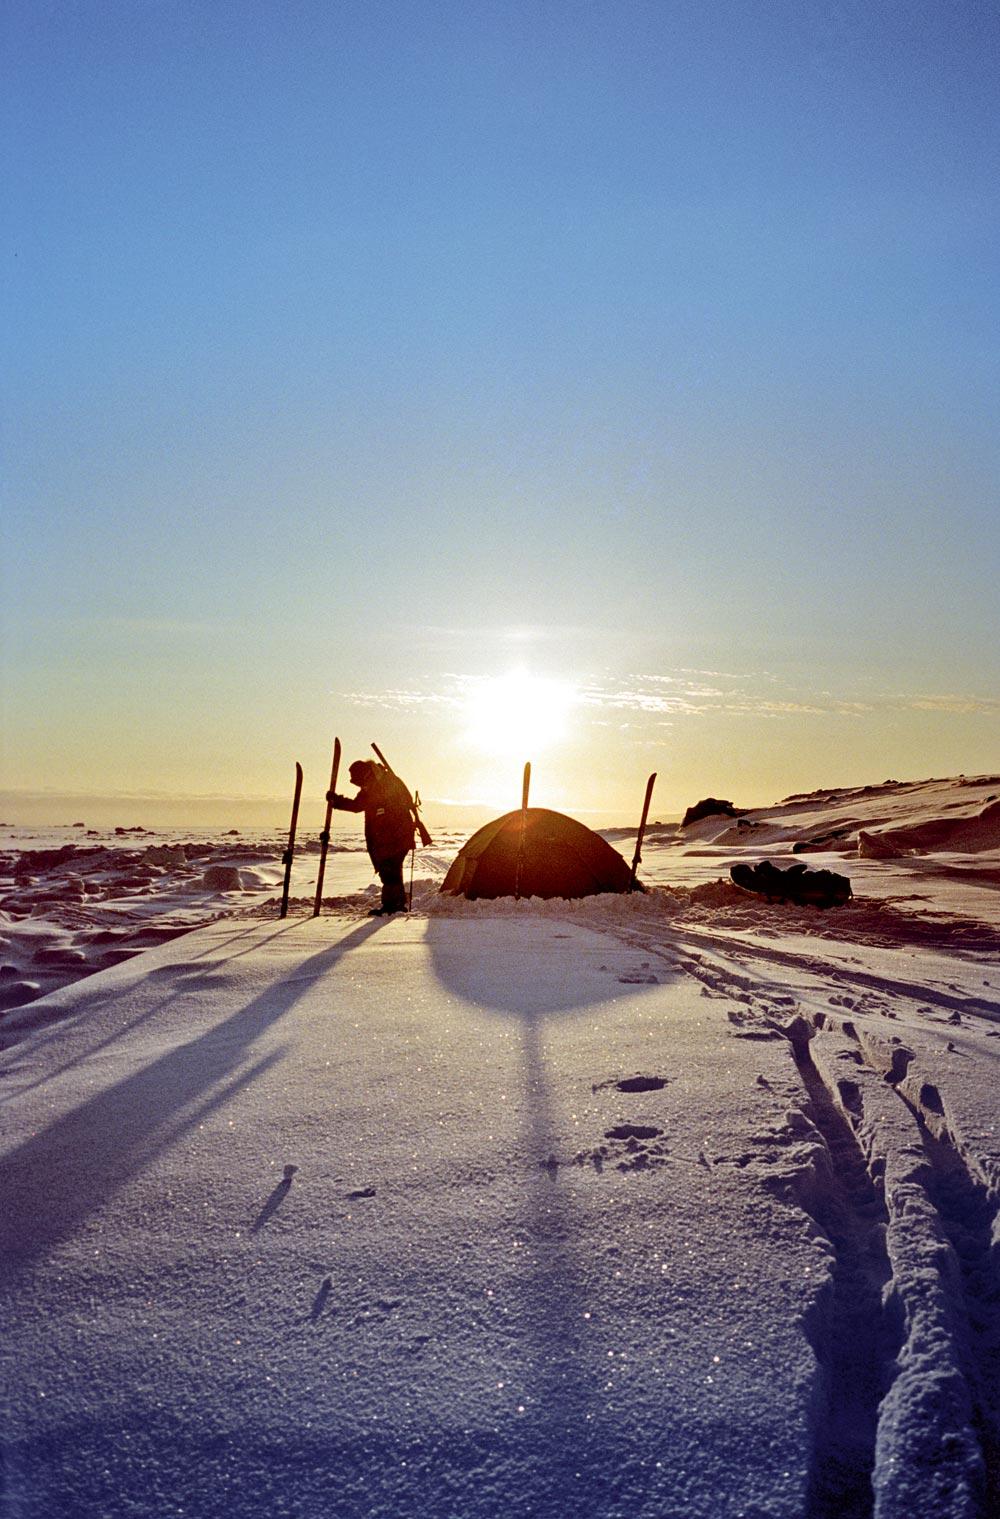 Arktyka / fot. Adam Wajrak